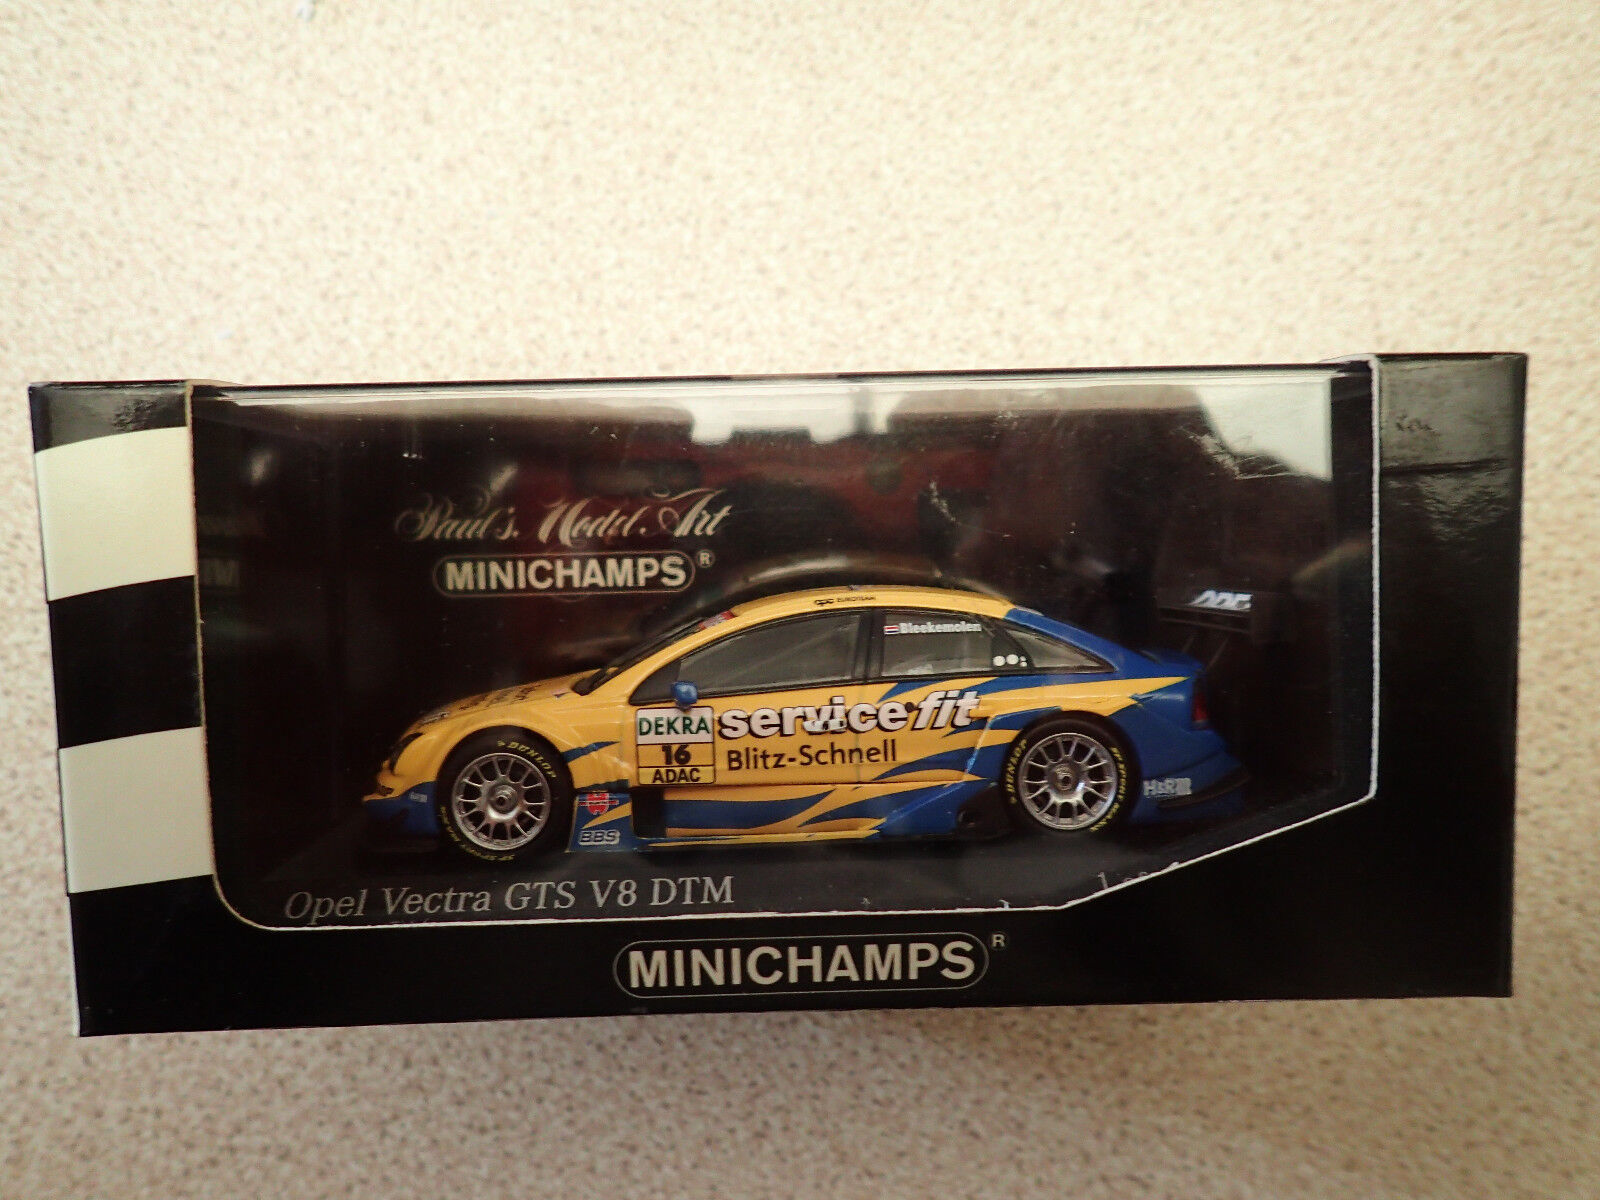 Ltd Edn Minichamps 1 43 400 044416 Opel Vectra GTS V8 DTM 2004 OPC Euredeam